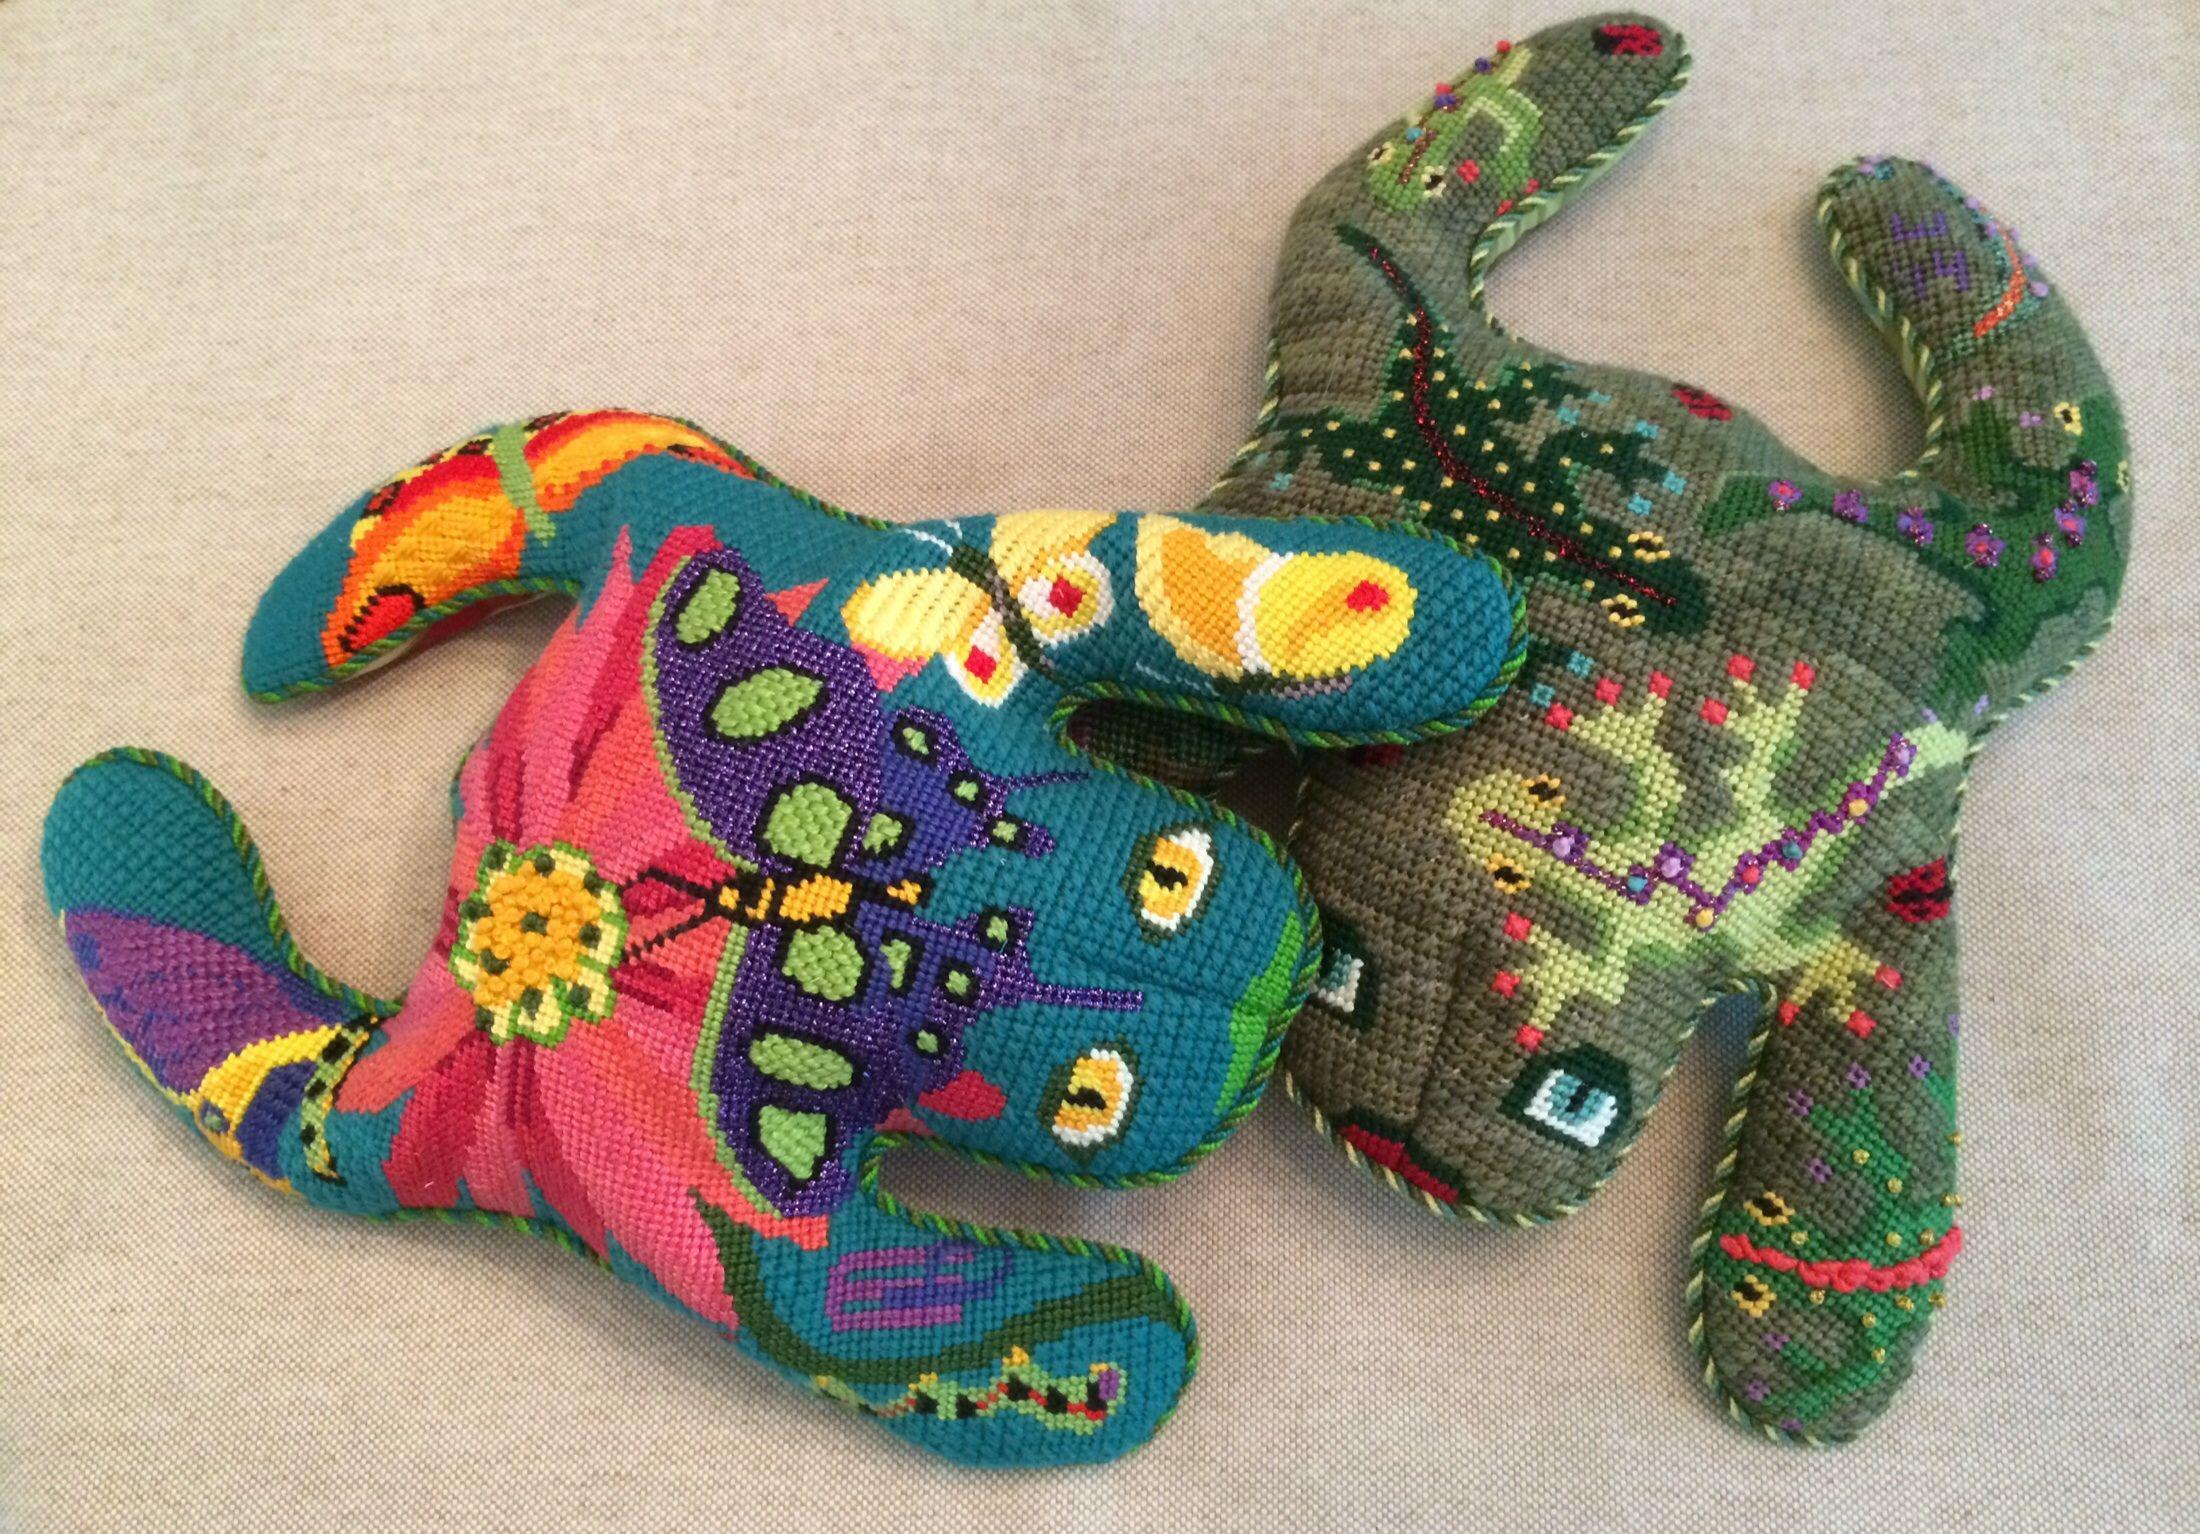 Pleasant Bean Bag Frogs On Their Way Back To Key West Canvases By Frankydiablos Diy Chair Ideas Frankydiabloscom